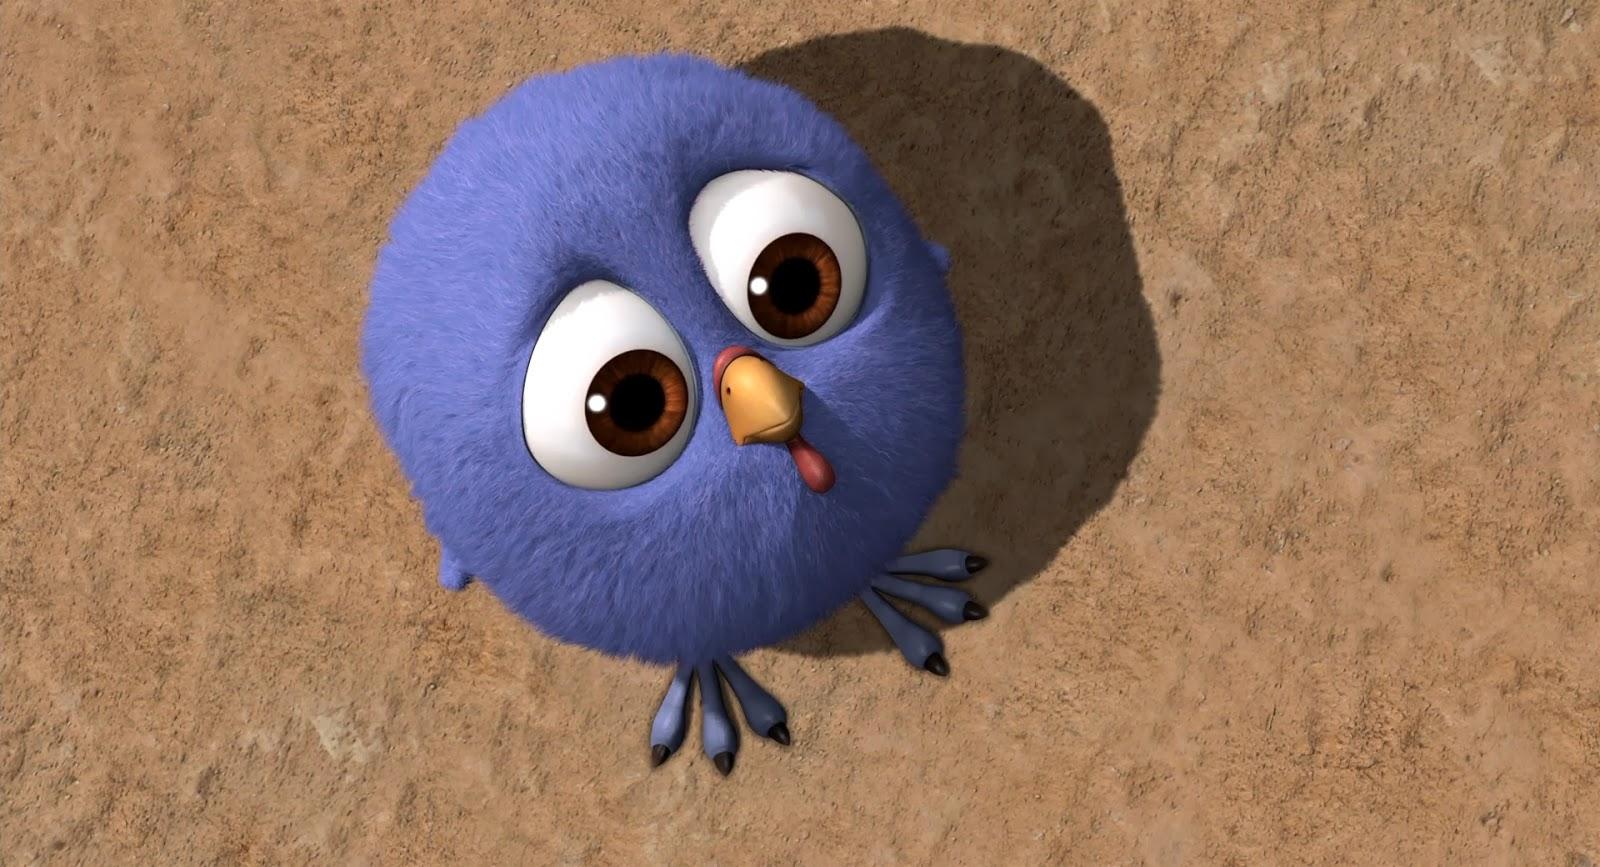 Free Birds (2013) S2 s Free Birds (2013)